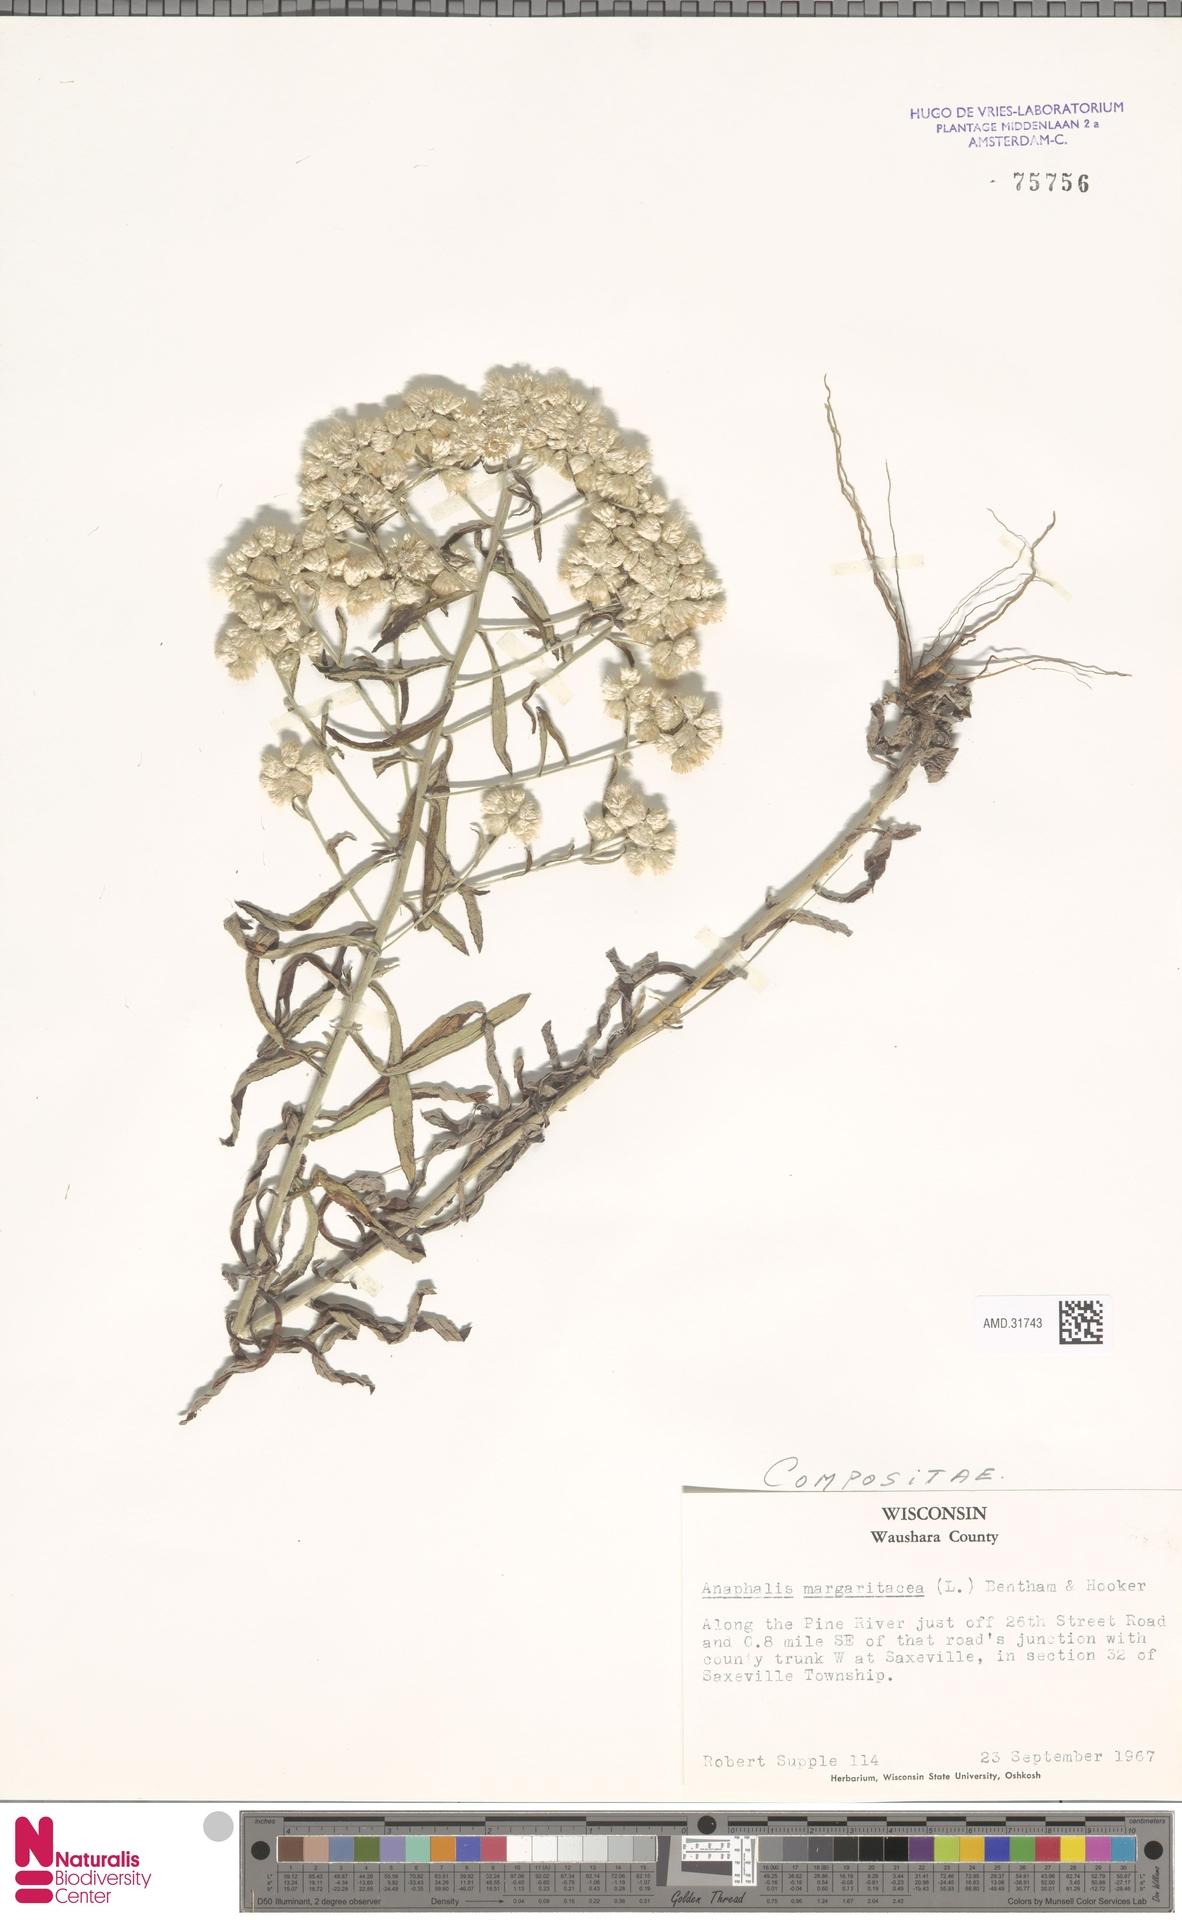 AMD.31743 | Anaphalis margaritacea (L.) Benth. & Hook.f.